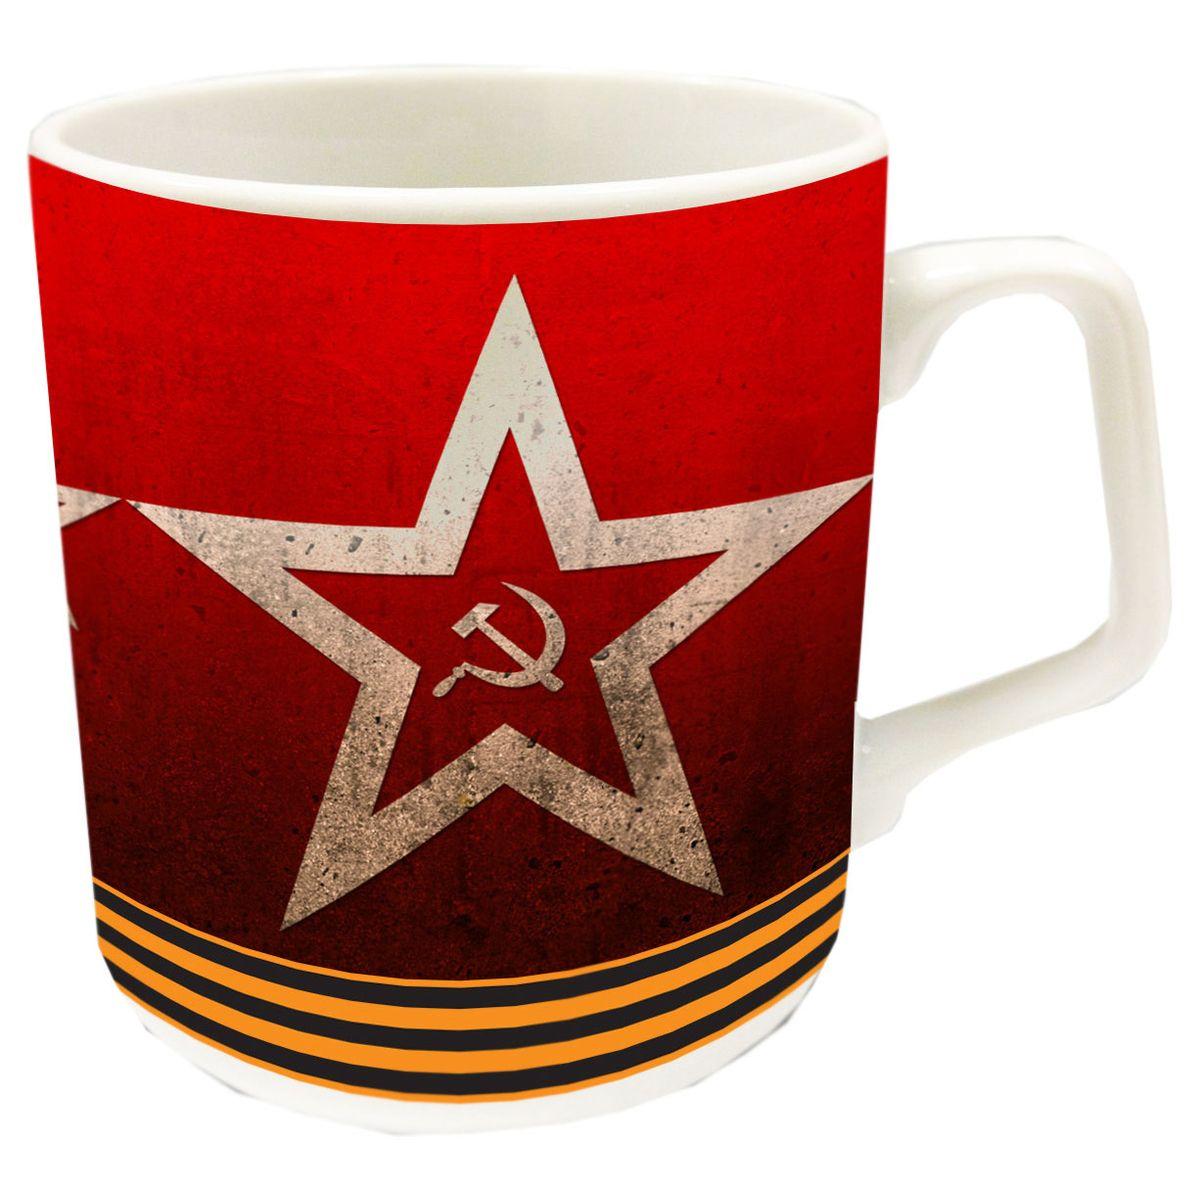 Кружка PrioritY Советская серия. Большая звезда, 350 мл кружка gift n home парижские цветы 350 мл